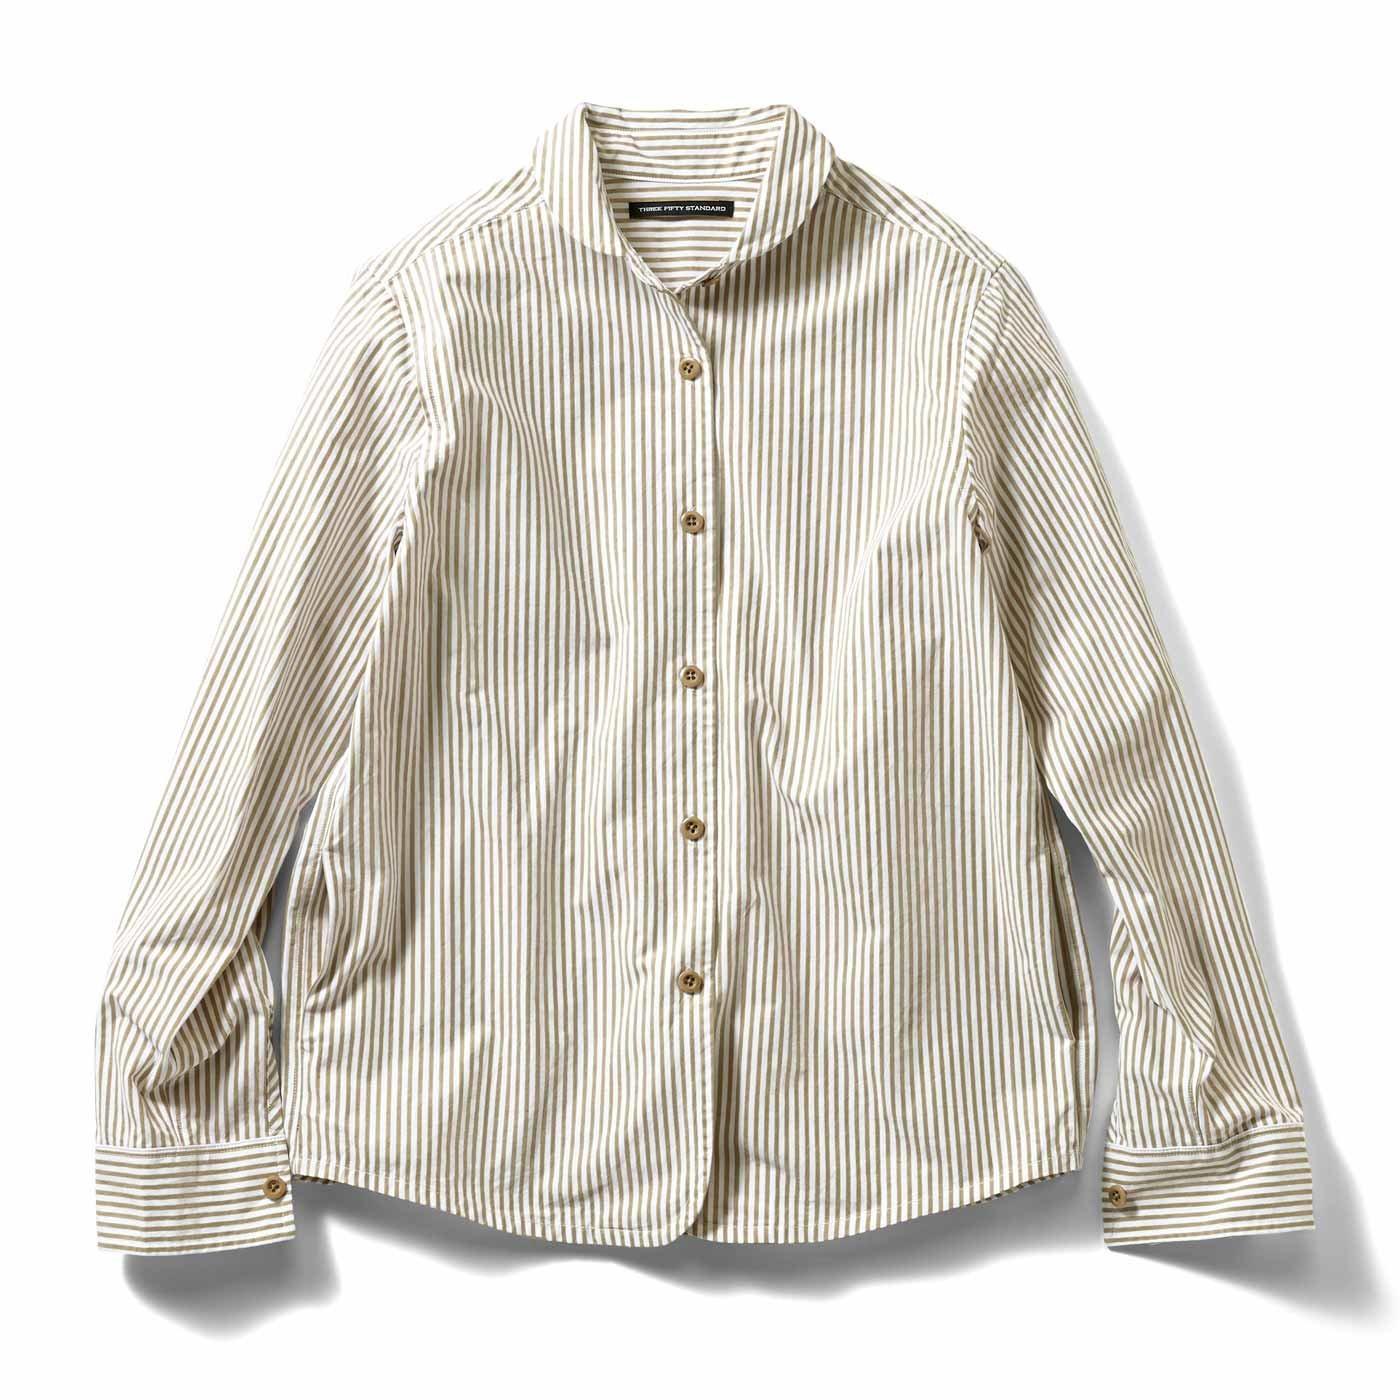 THREE FIFTY STANDARD ジャケットみたいに着こなす ストライプシャツ